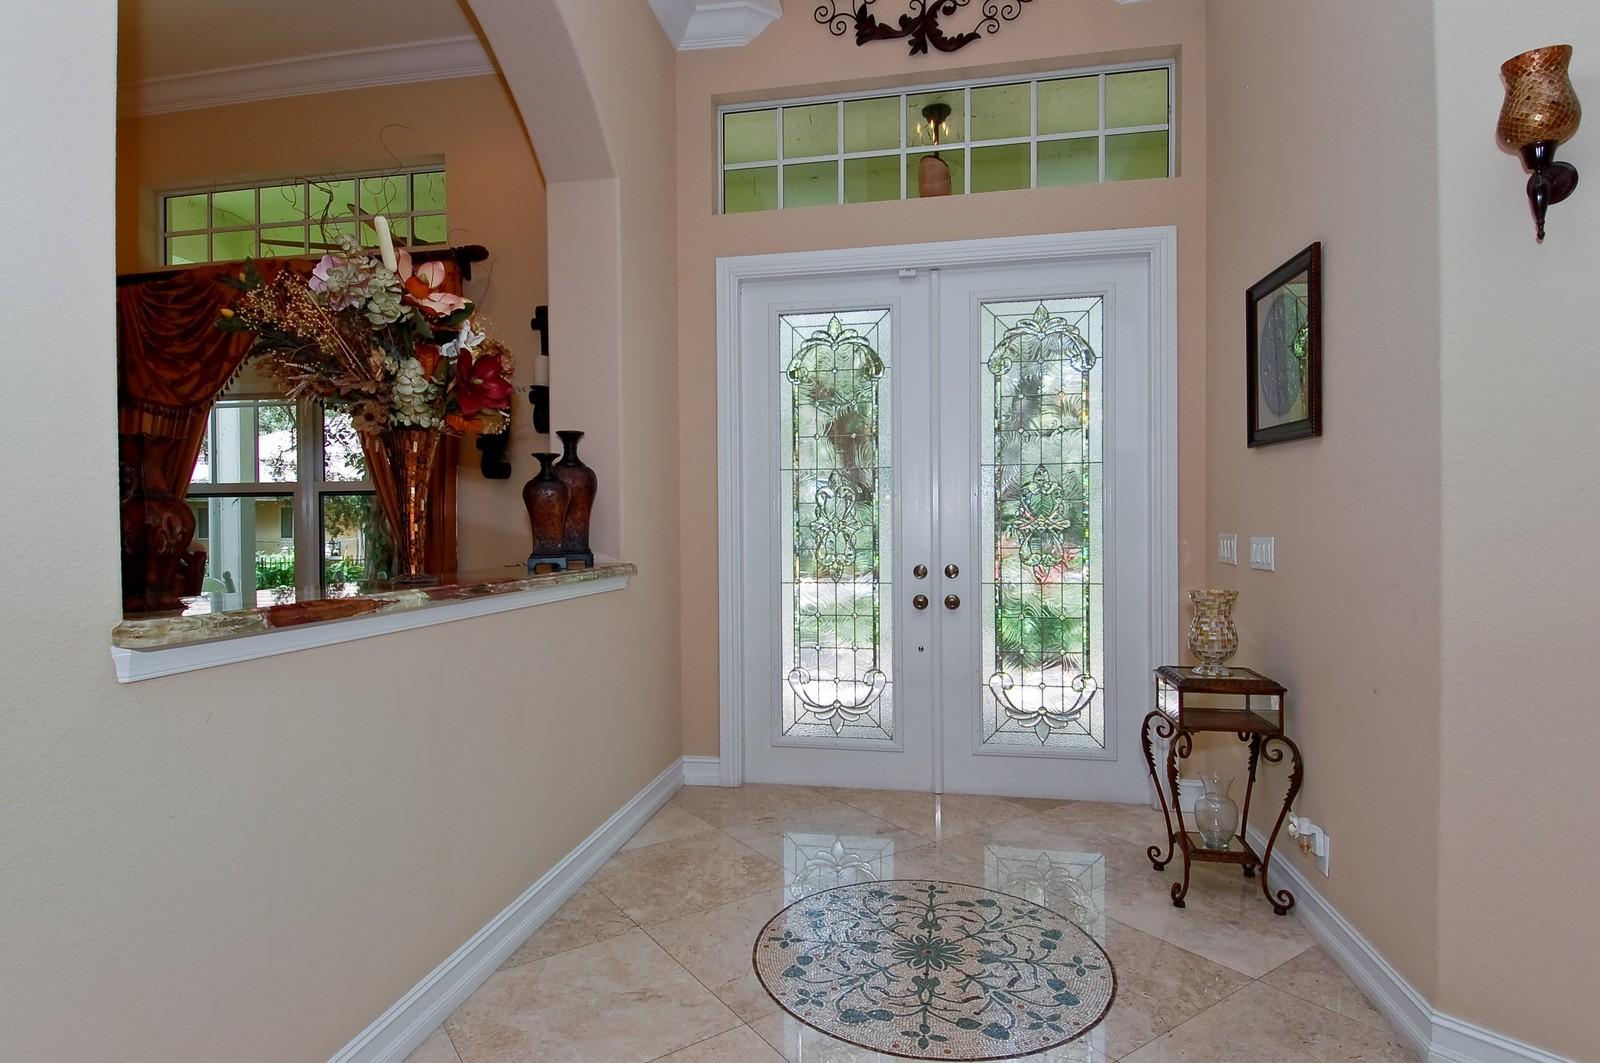 Real Estate Photography - 5400 Woodlanden Ln, Ft Lauderdale, FL, 33021 - Foyer